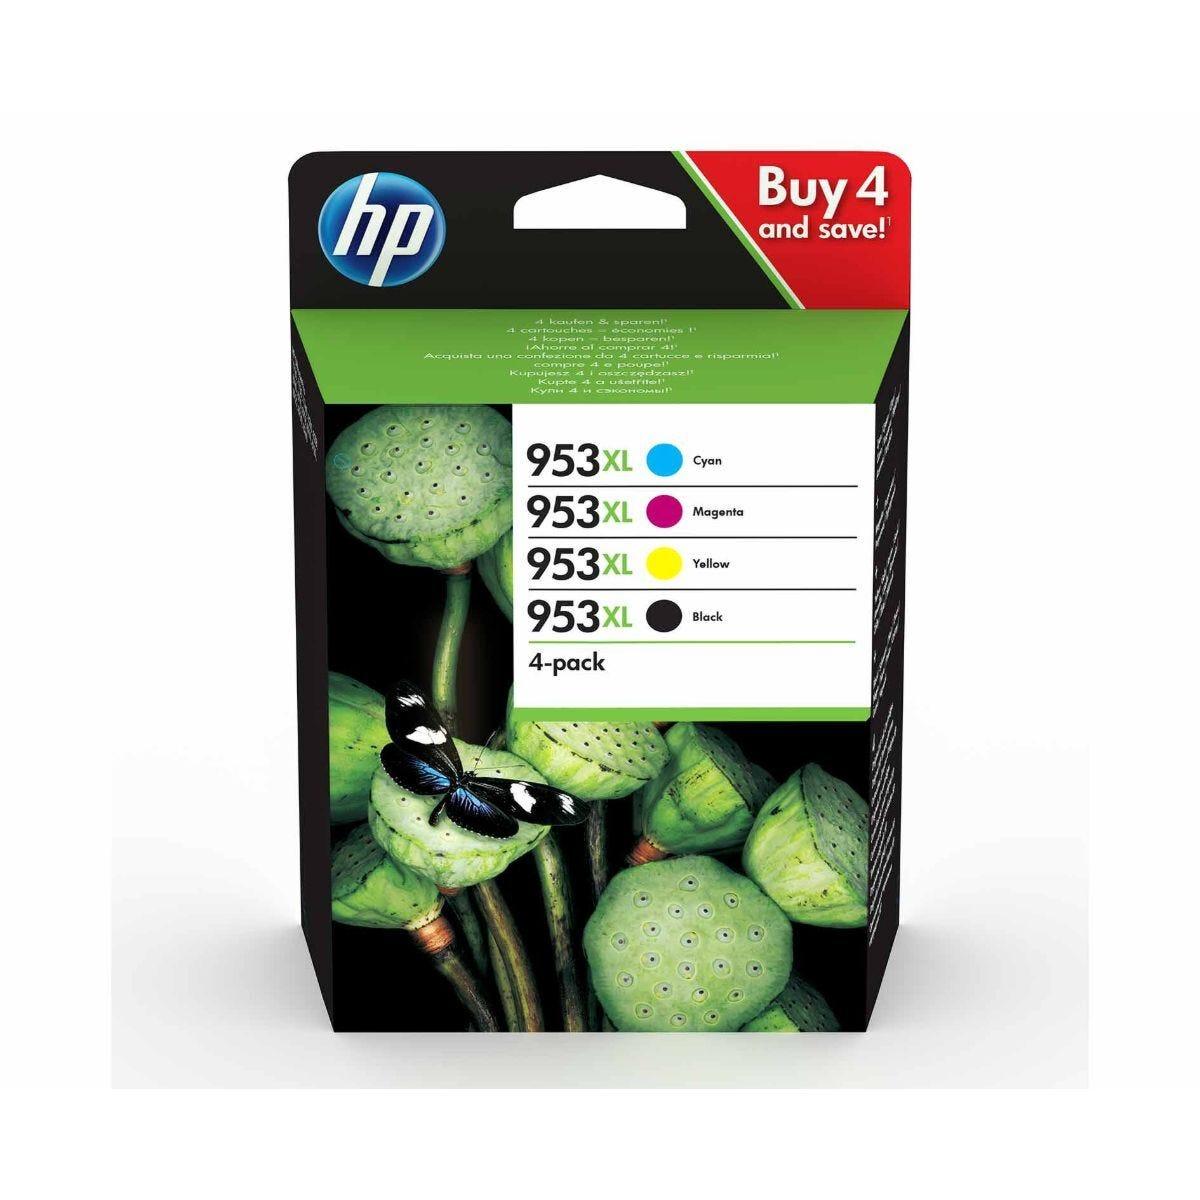 HP 953XL CMYK Multipack Original Ink Cartridge